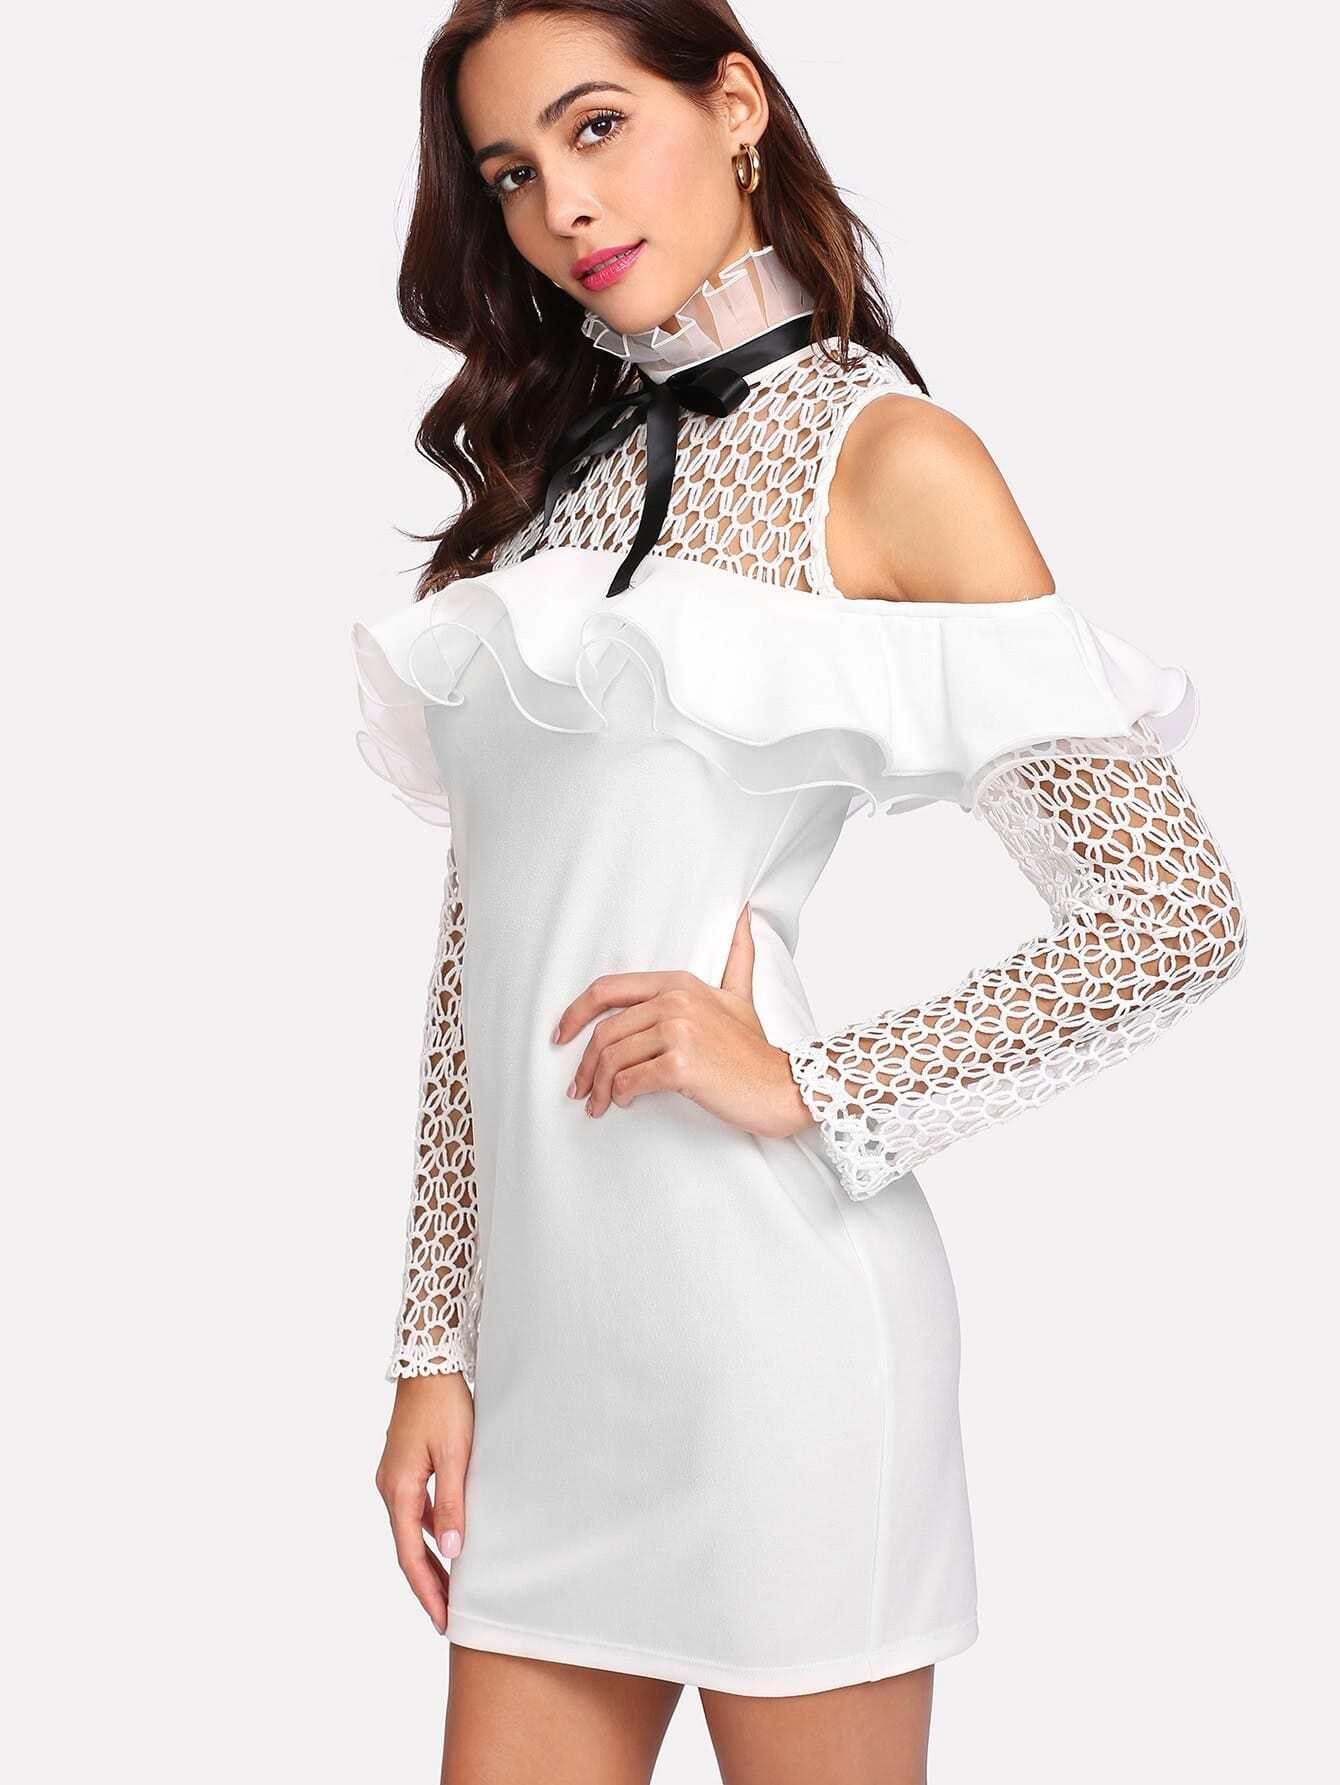 Ruffle Trim Eyelet Crochet Cold Shoulder Dress